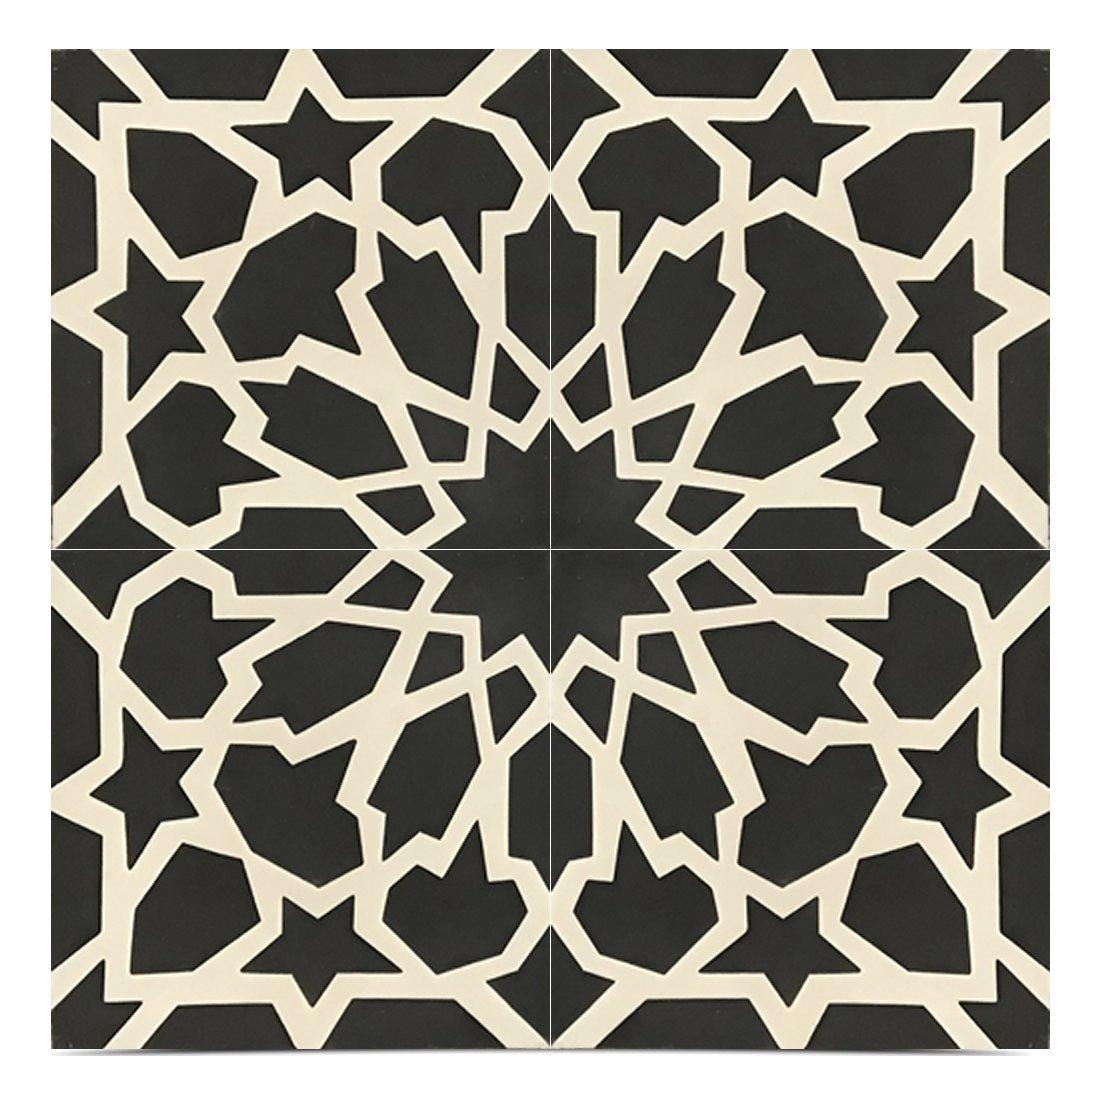 Moroccan Mosaic & Tile House CTP40-01 Bahja Handmade Cement Tile, 8x8'', Black/White